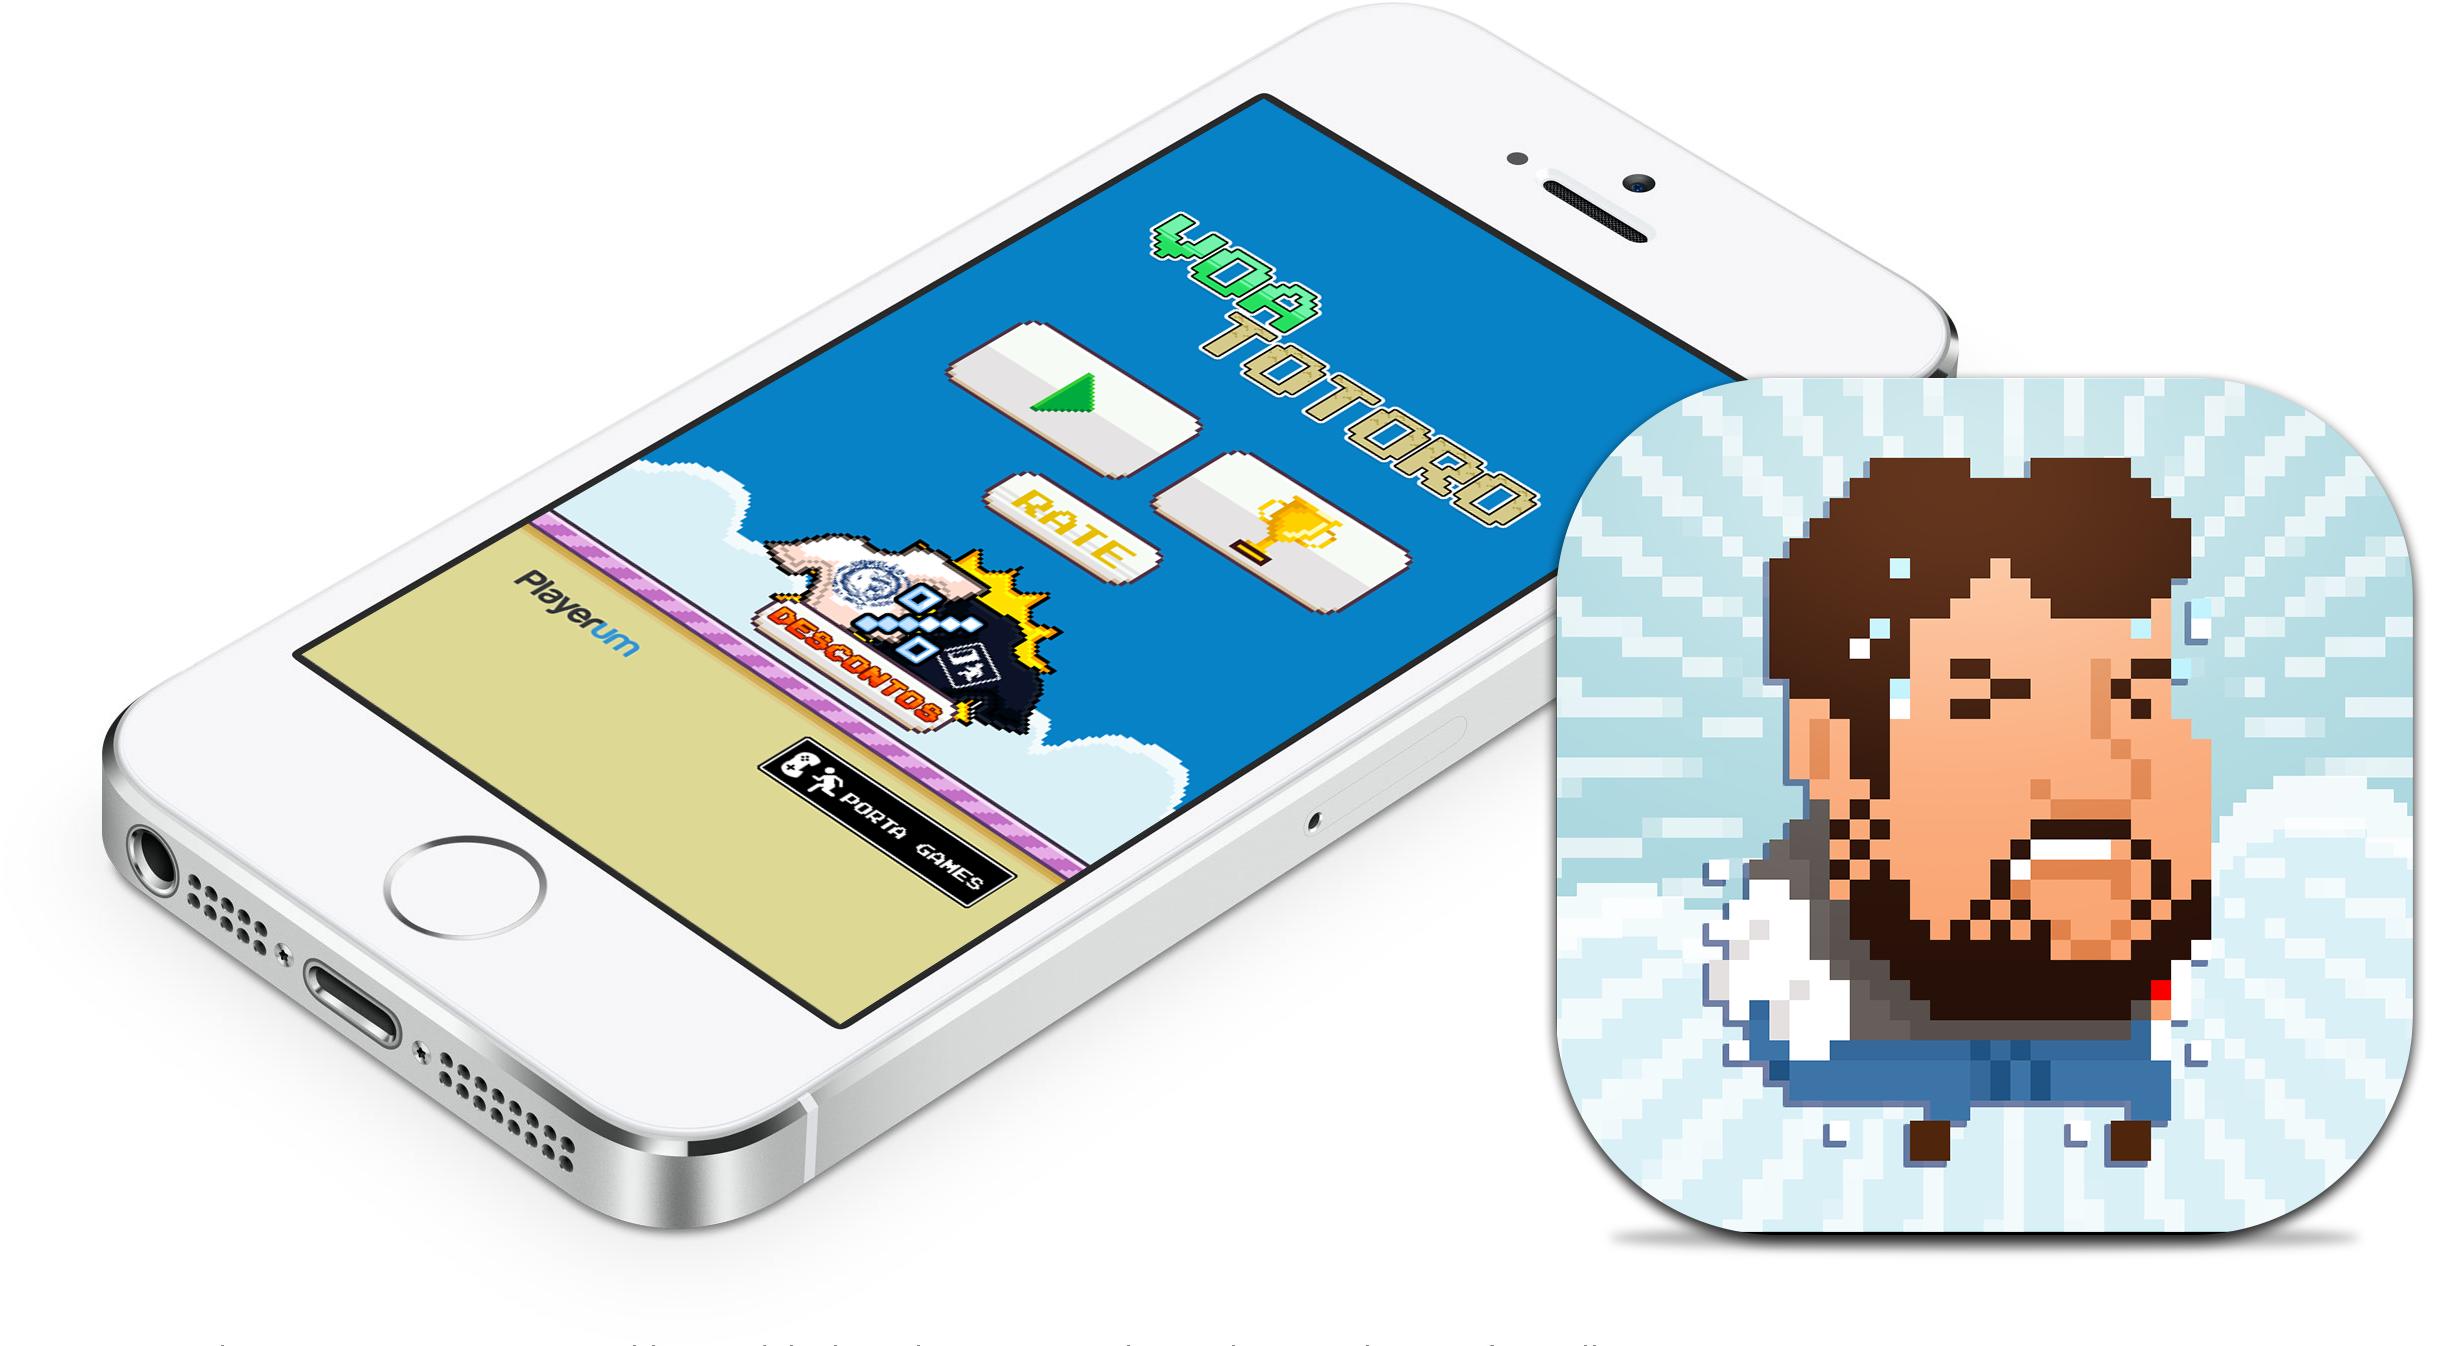 Voa Totoro (Porta dos Fundos) - iPhone e icone